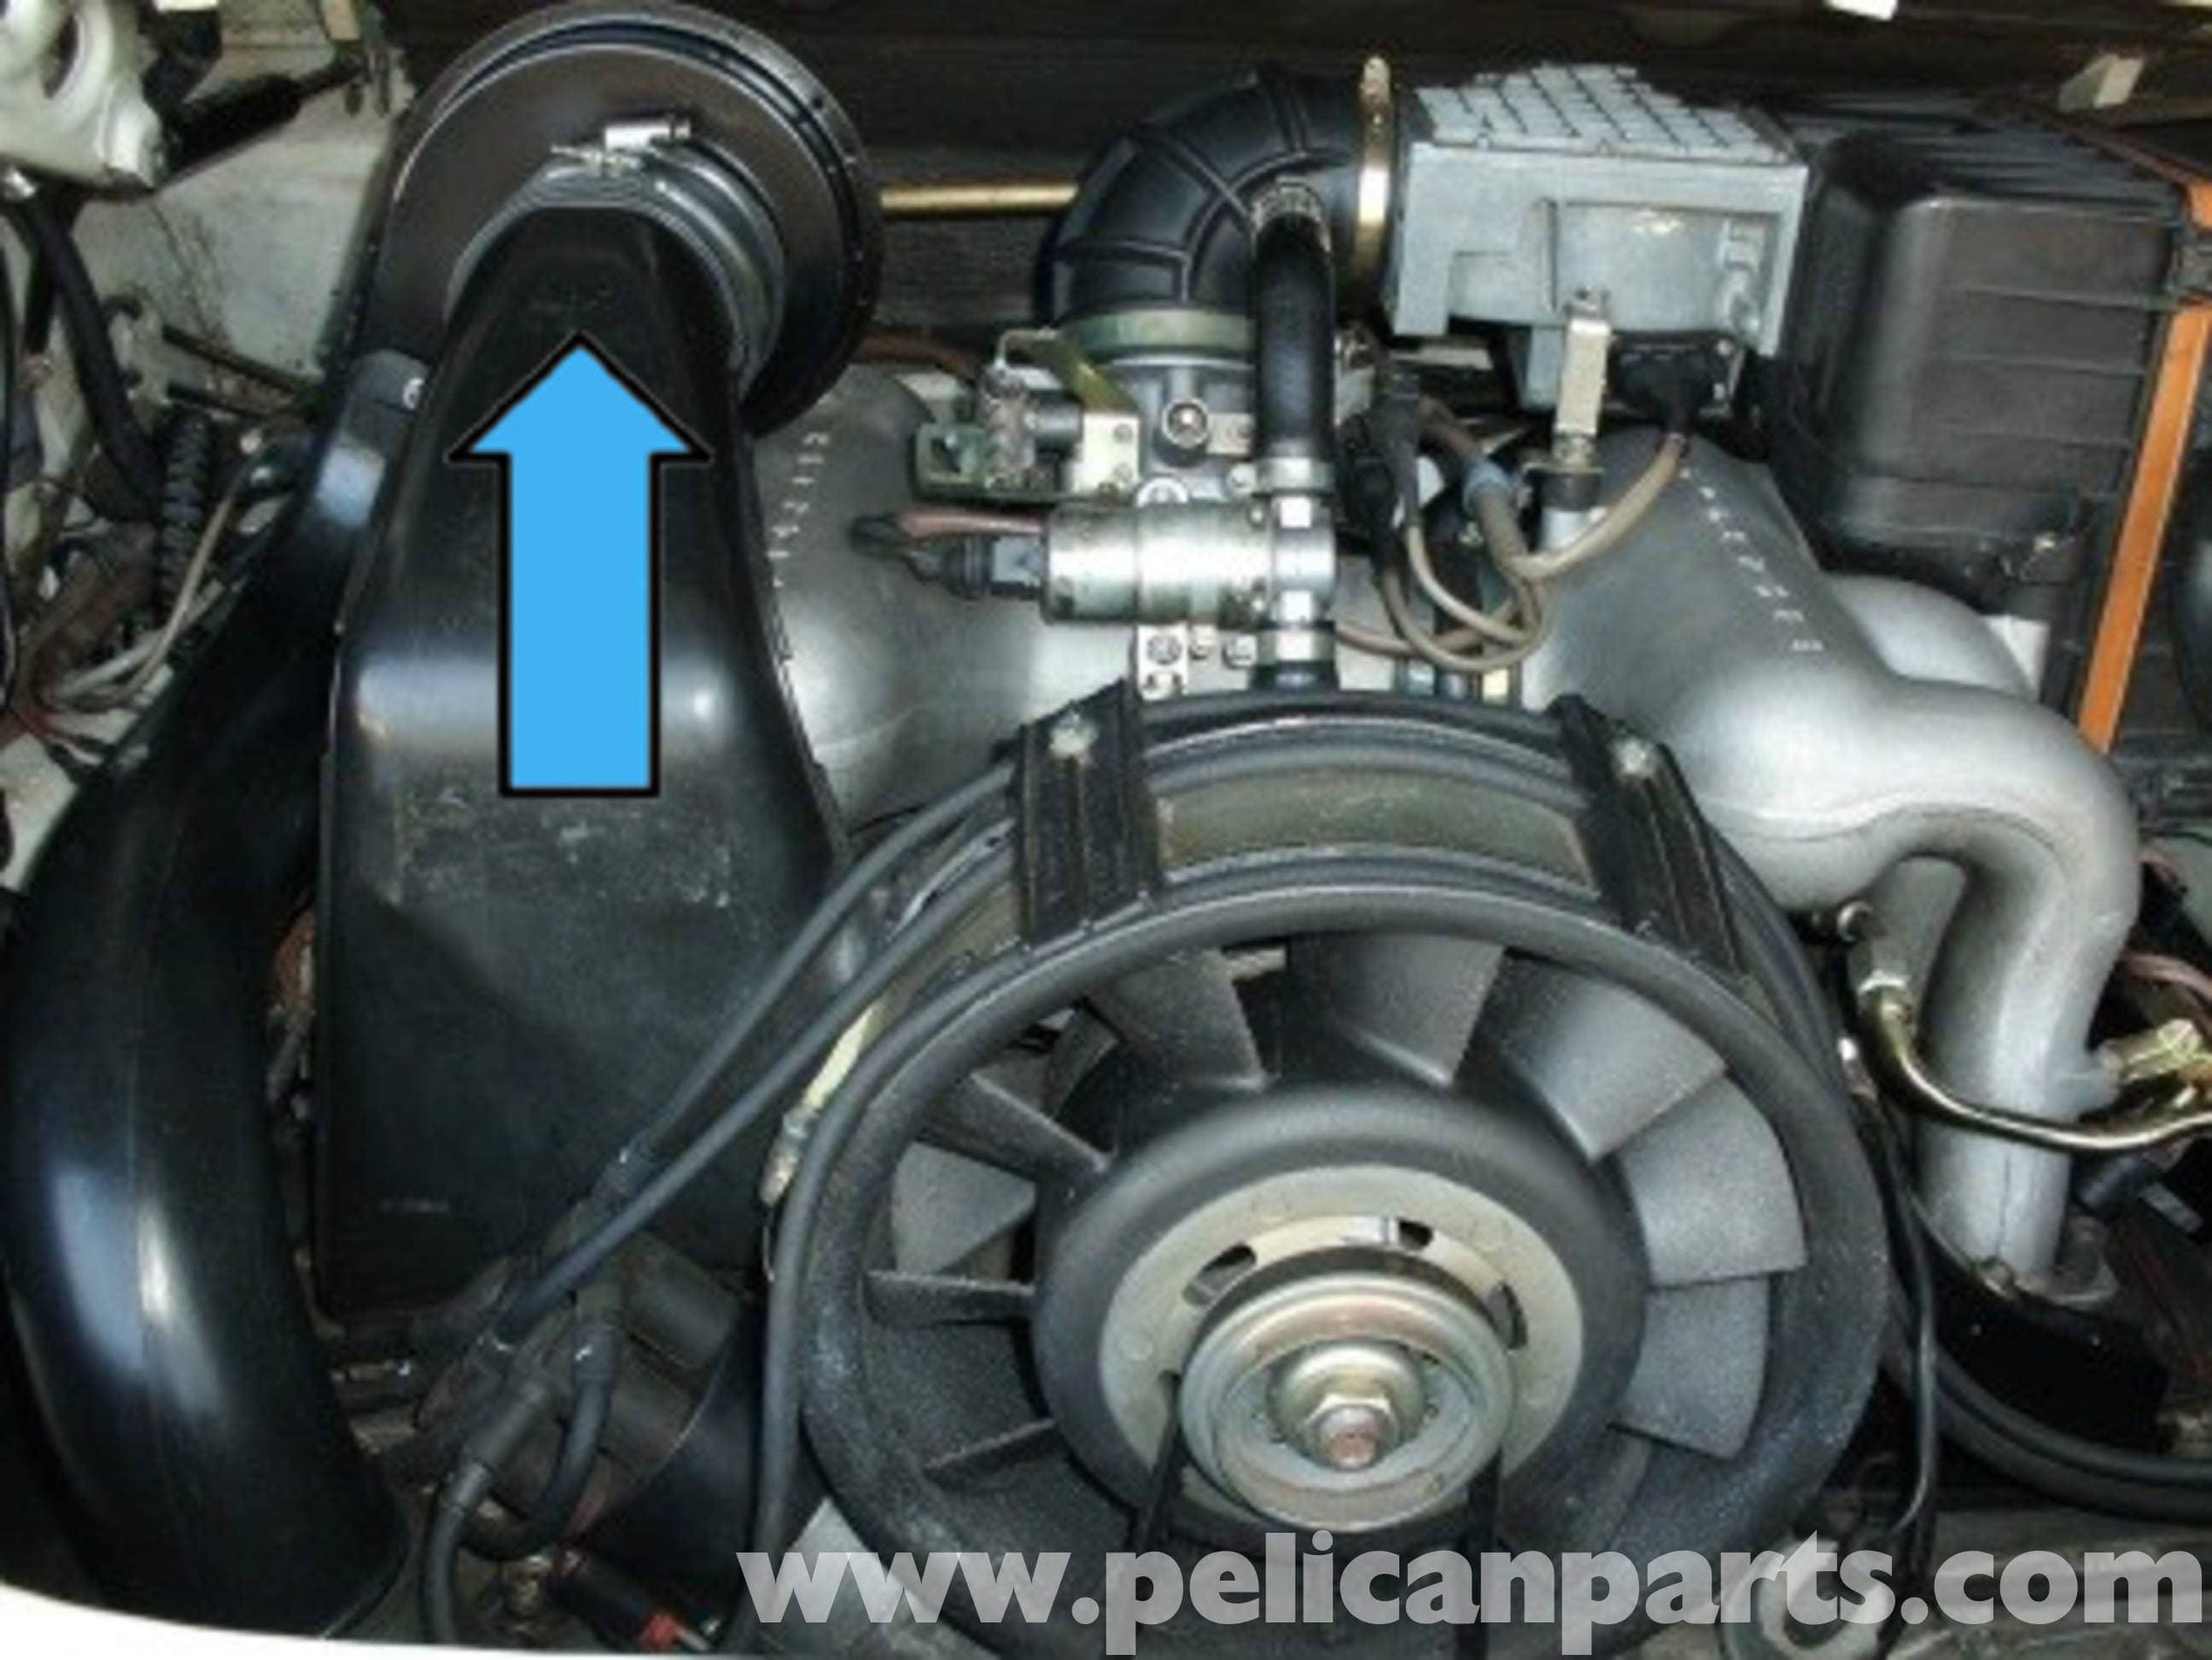 1997 Ford Explorer Fuse Diagram Under Hood Porsche 911 Heater Blower Motor Replacement 911 1965 89